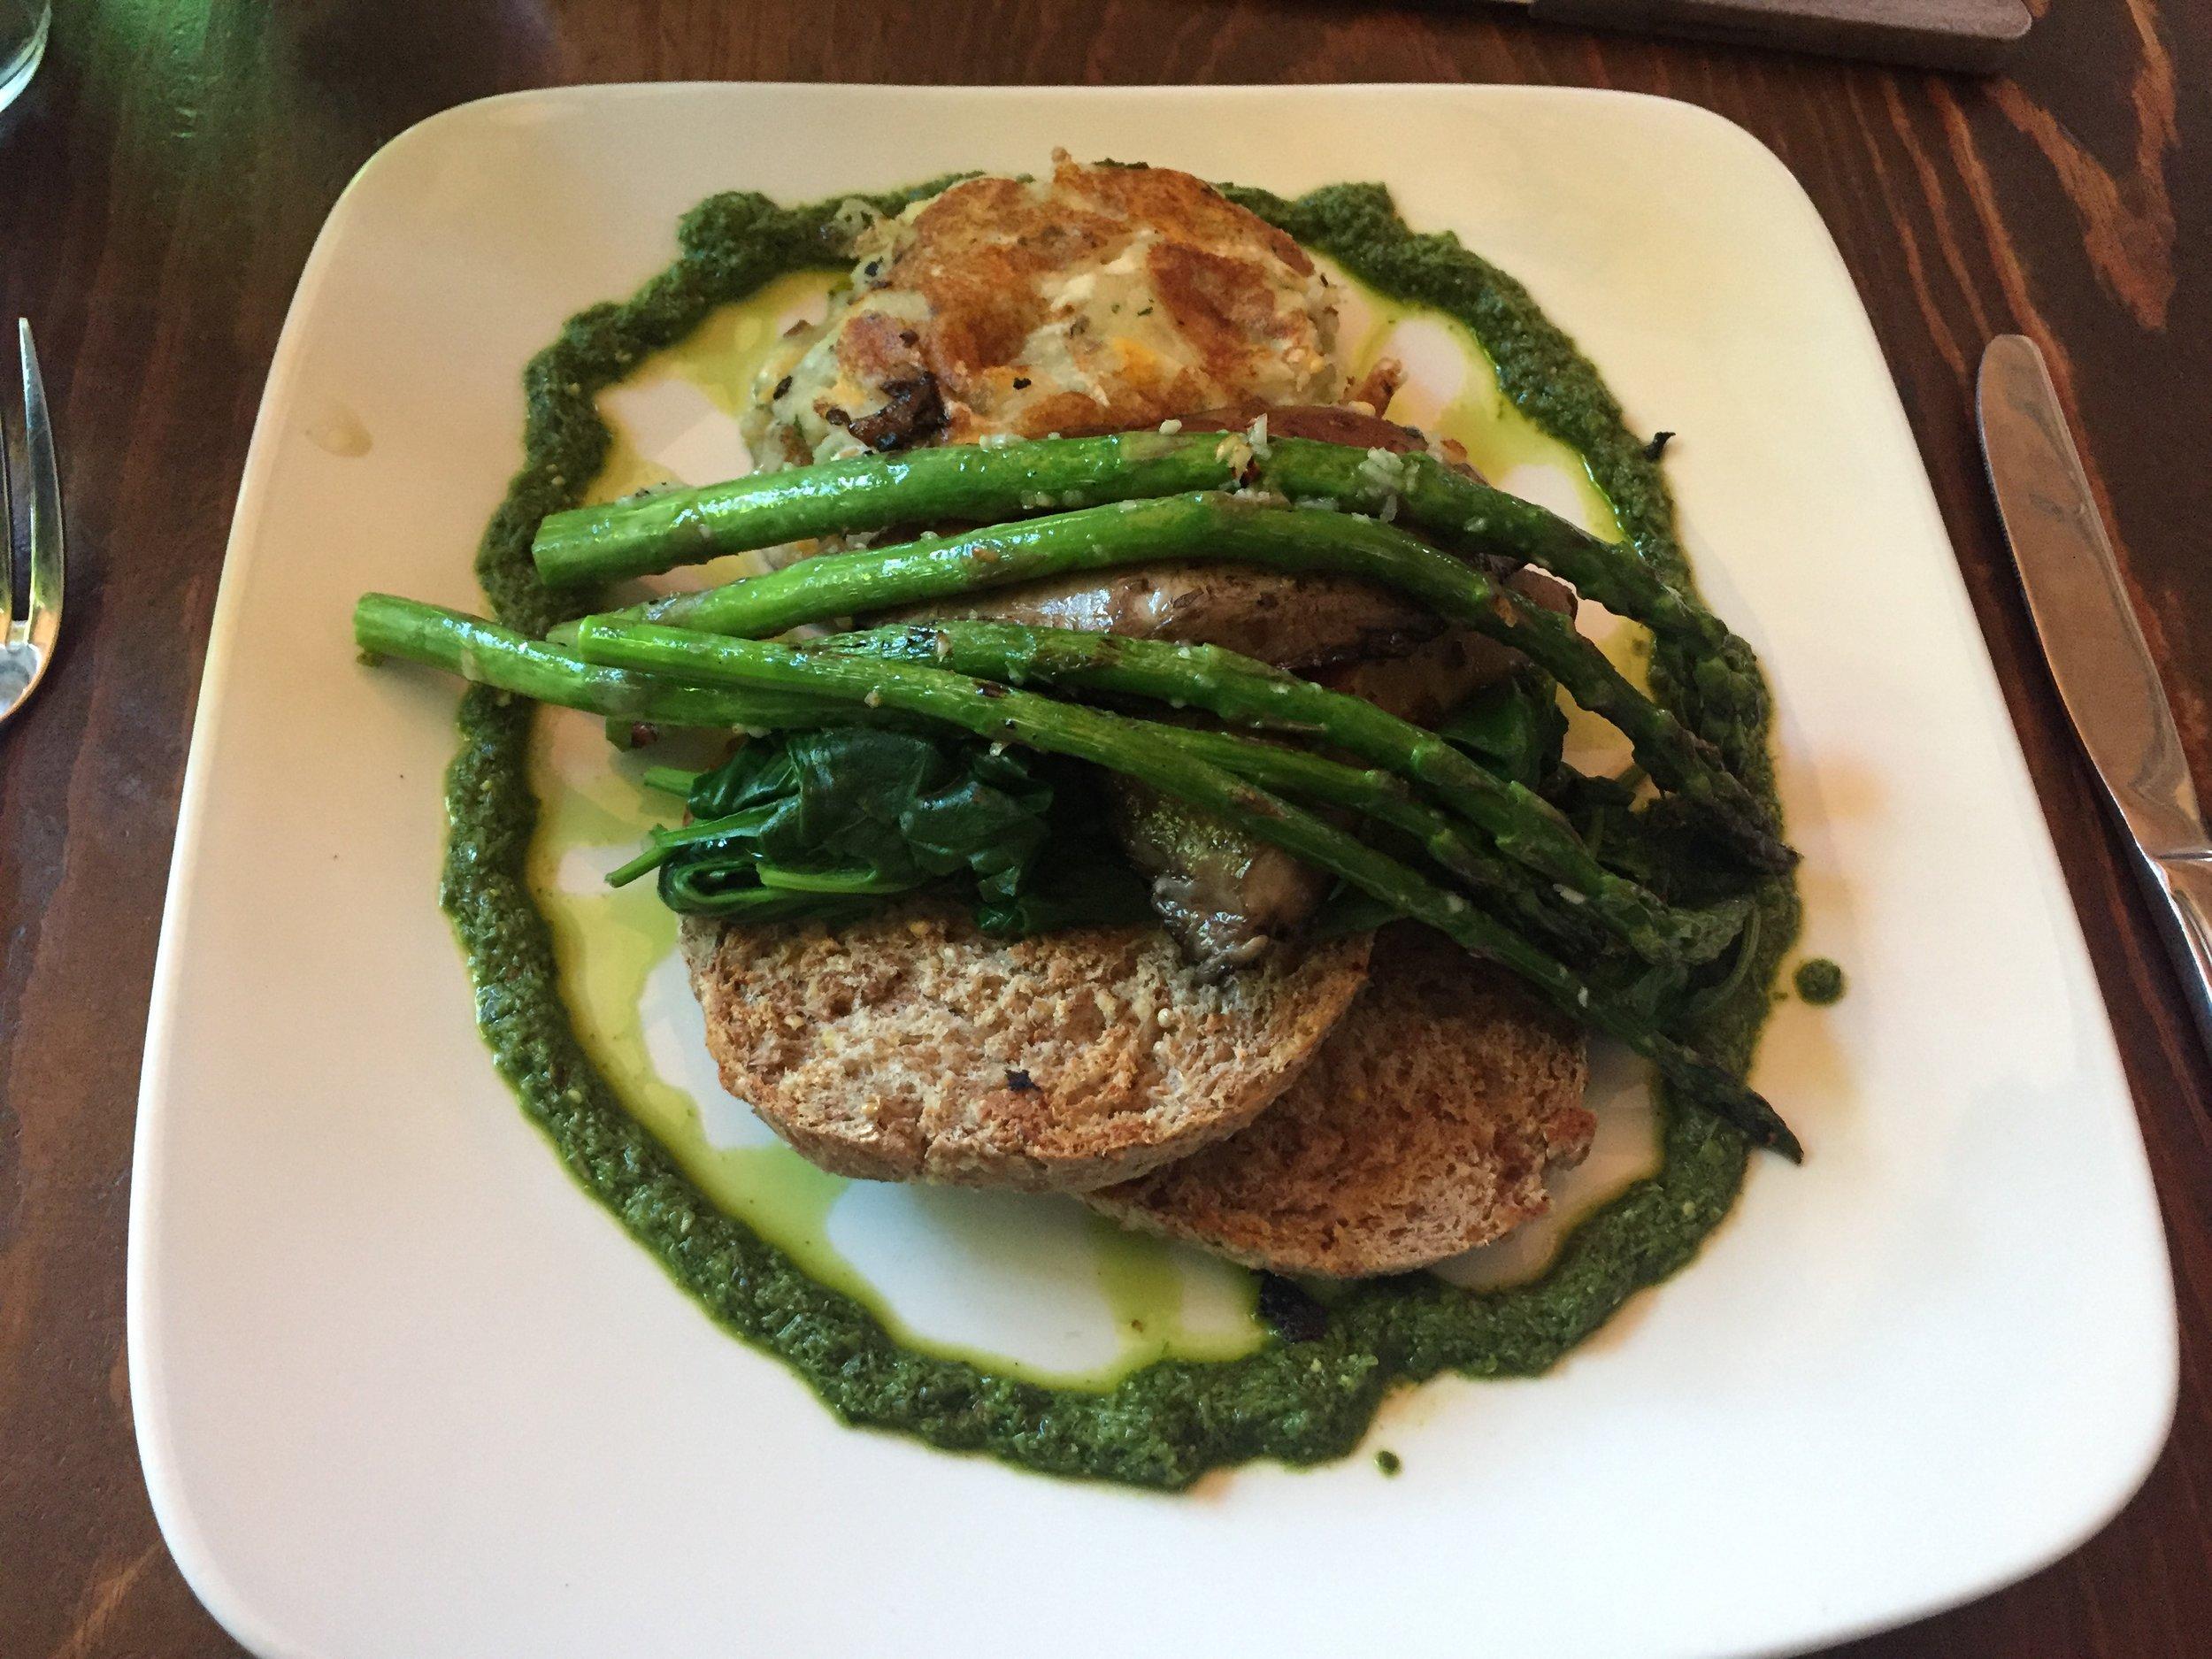 Veggie Slam from Plum Bistro vegan restaurant